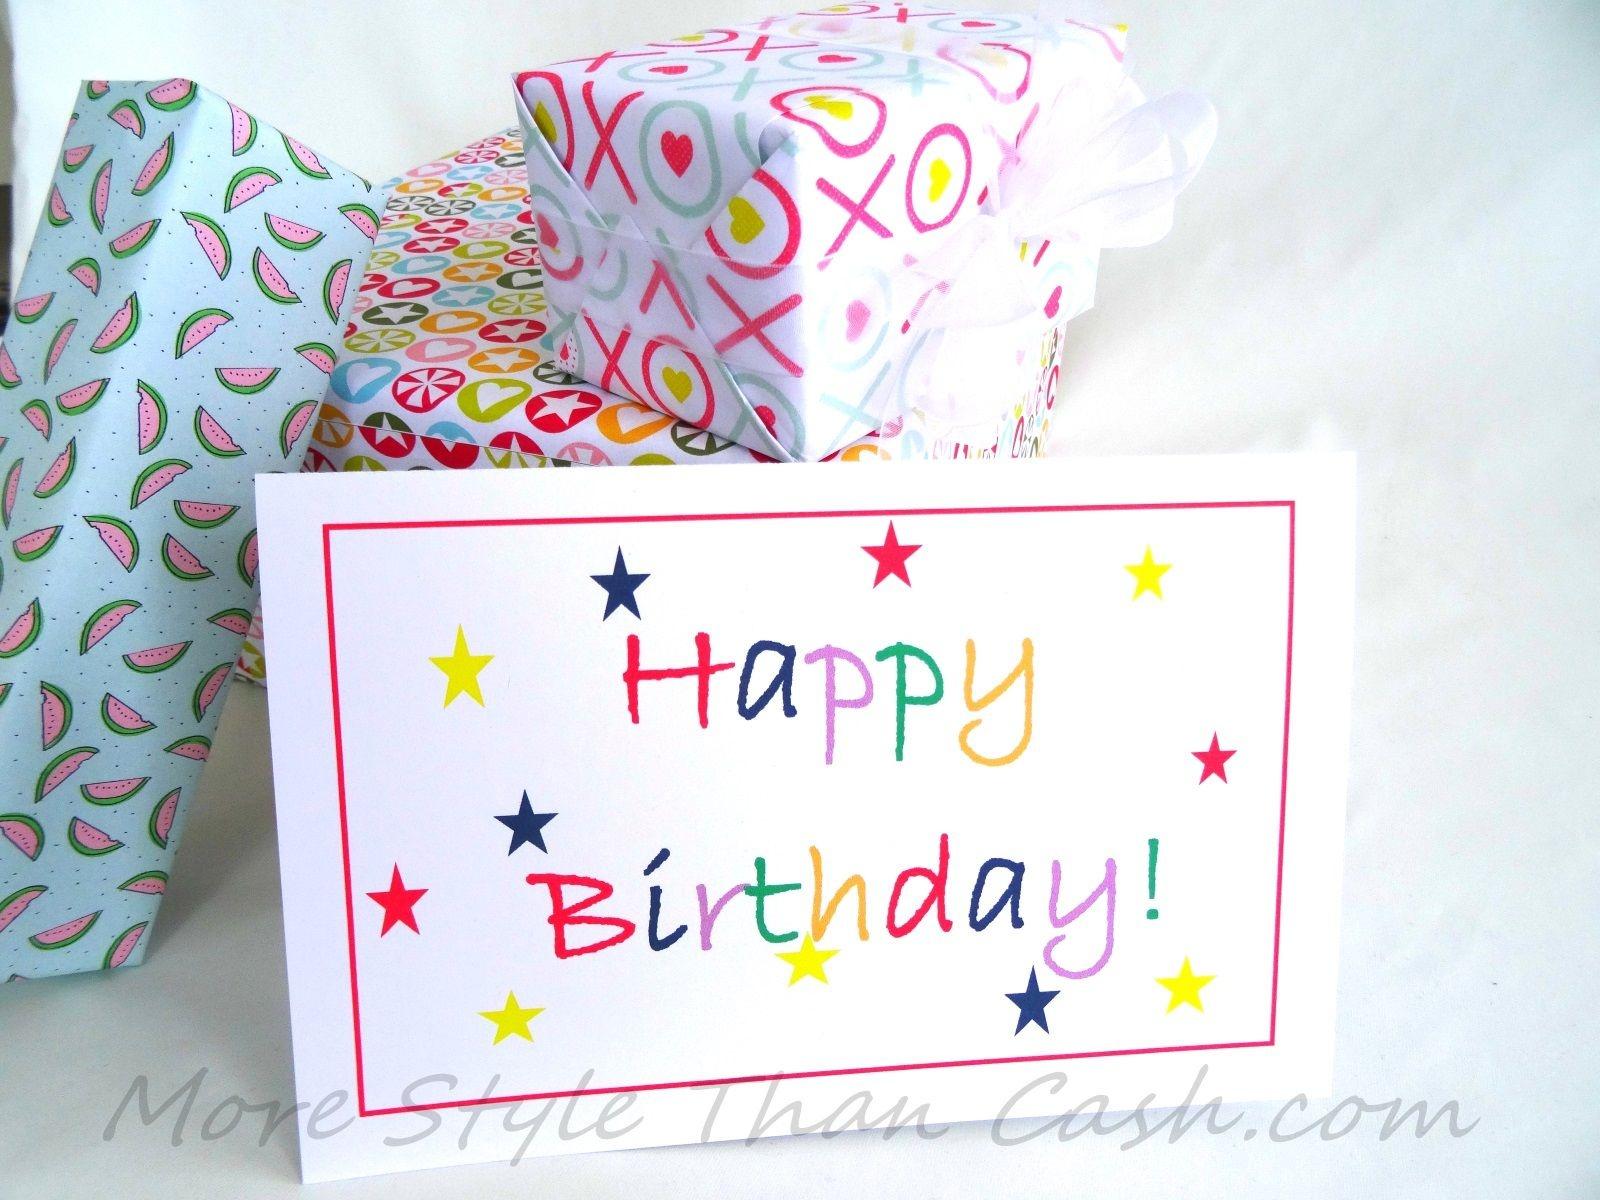 Free Printable Birthday Card | Great Teacher Stuff!!! | Free - Free Printable Birthday Cards For Her